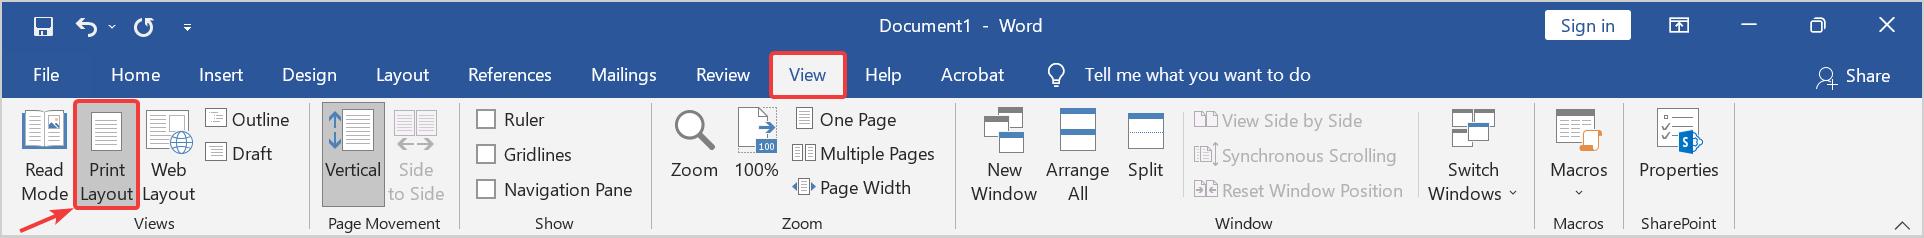 Print Layout Word. View Print Layout